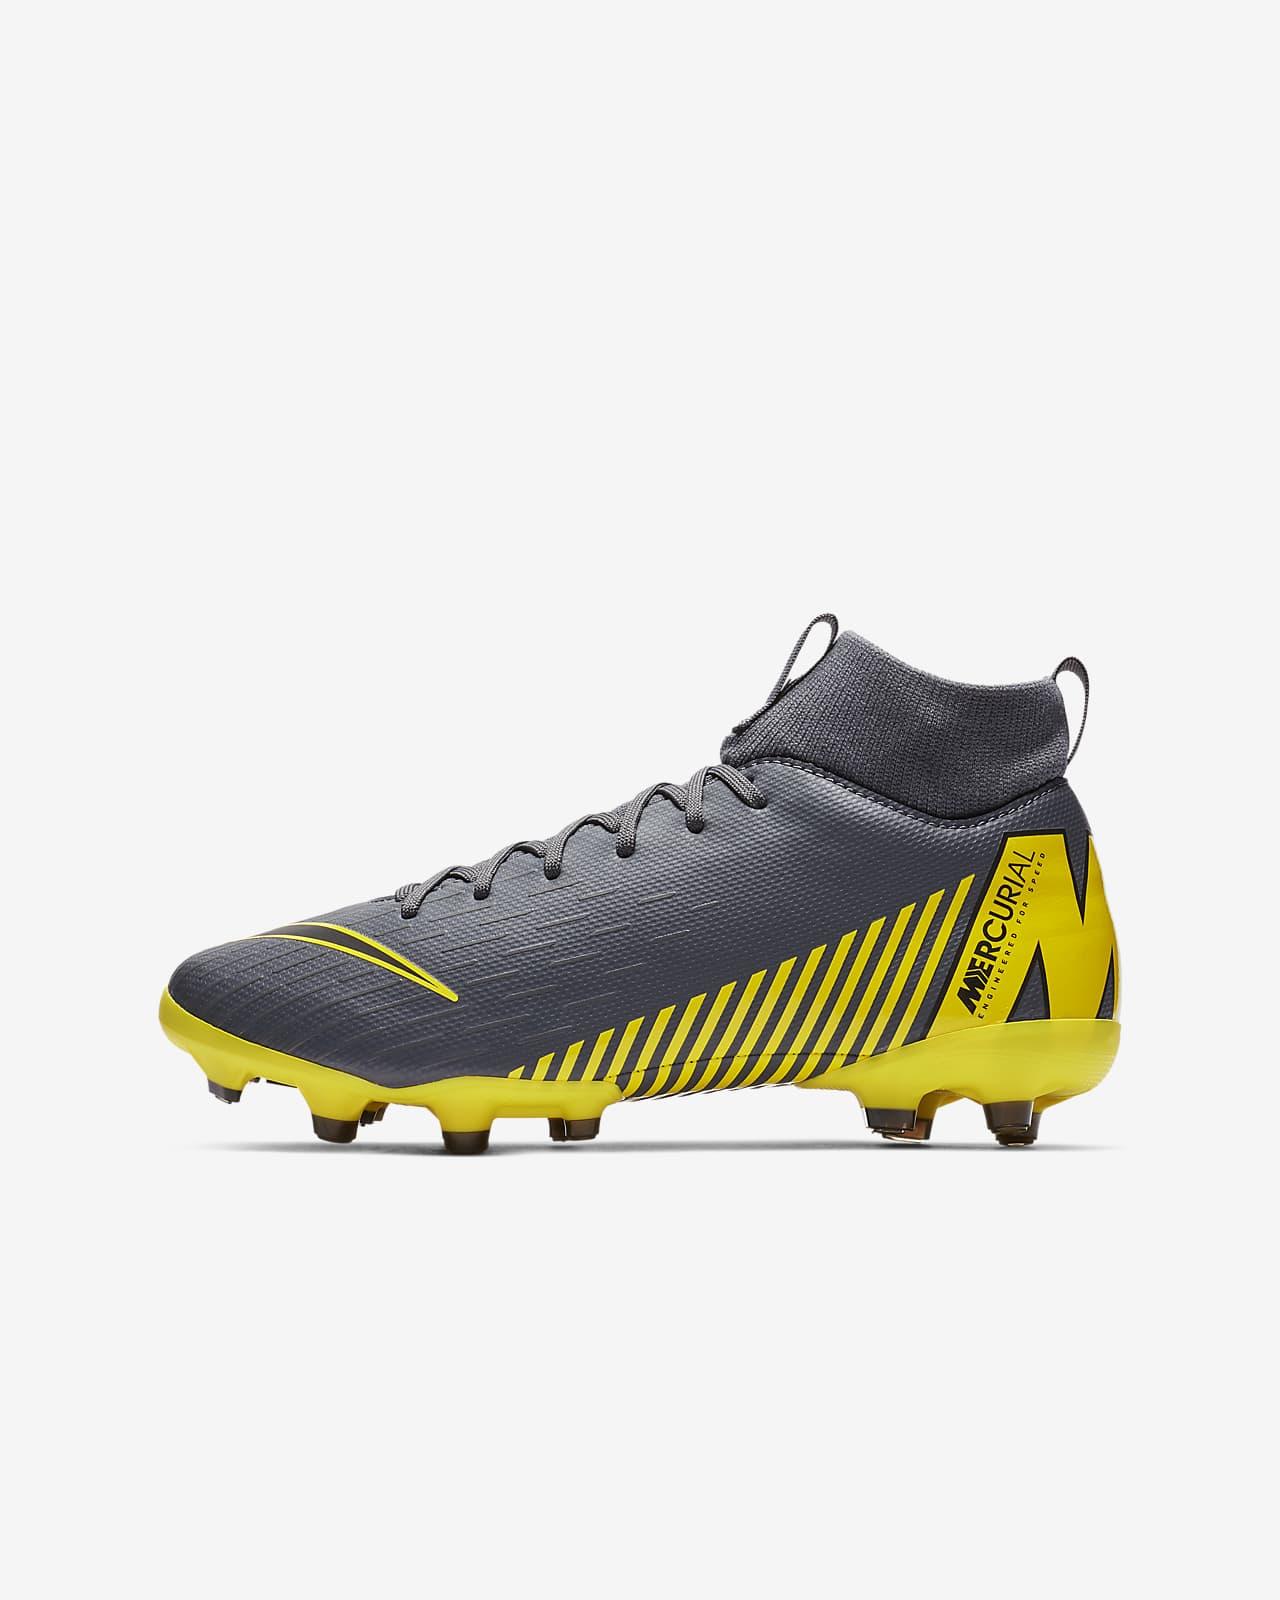 Diplomático Perdóneme Puntuación  Nike Jr. Superfly 6 Academy MG Game Over Botas de fútbol para múltiples  superficies para niño/a y niño/a pequeño/a. Nike ES